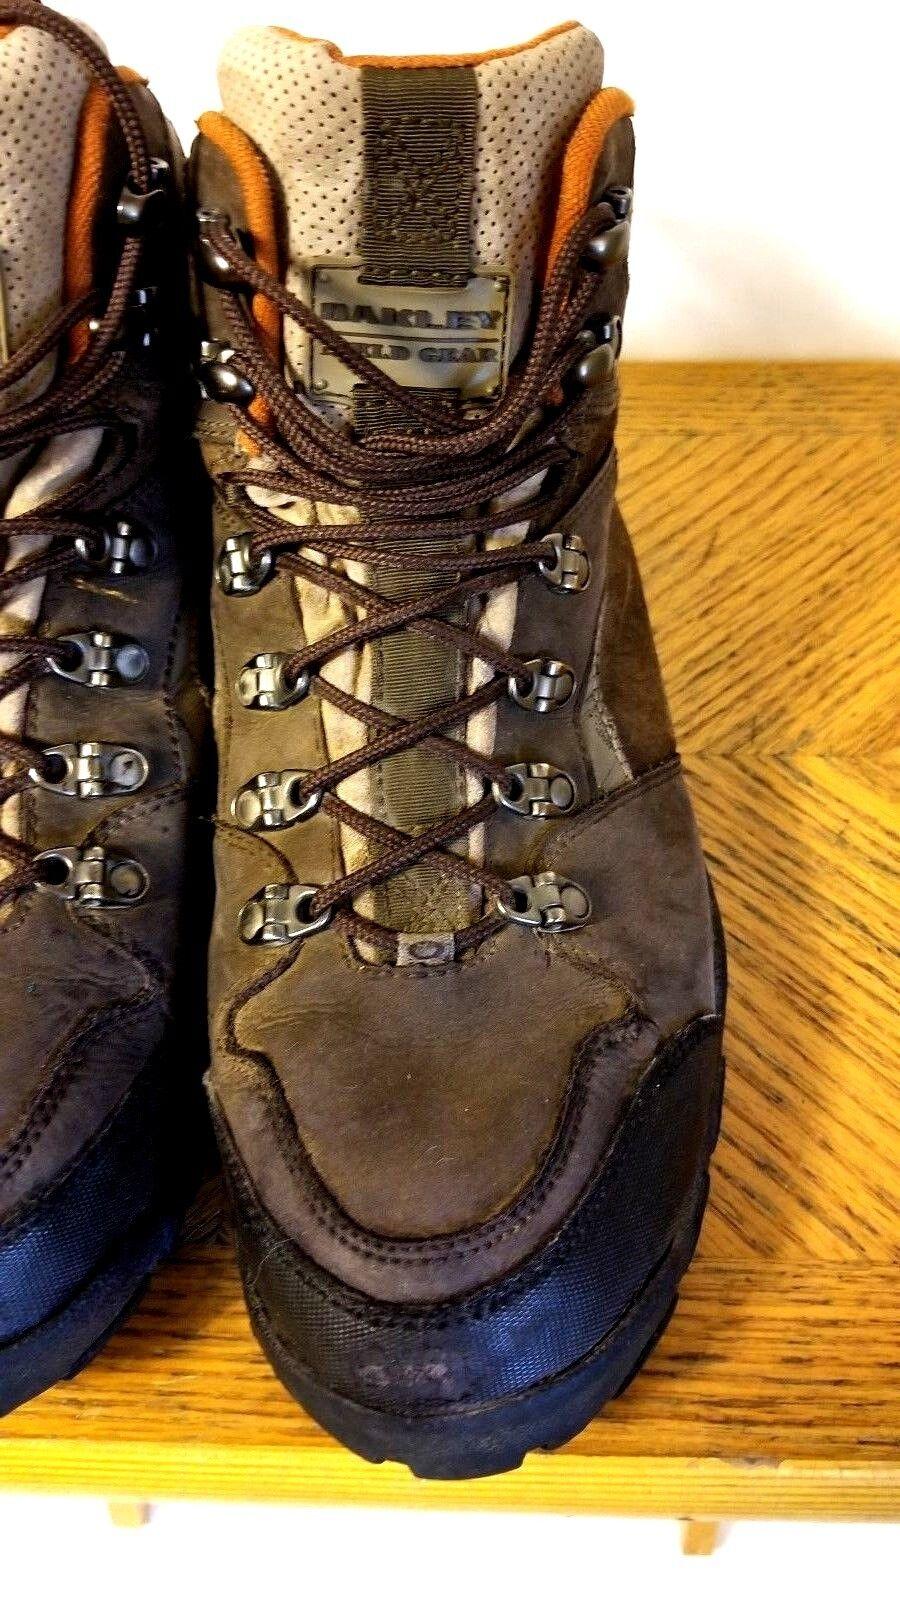 Vntg Oakley Oakley Vntg senderismo campo De Gamuza Marrón Gear Para Hombre Resistente Al Agua Zapatos M 5157e3